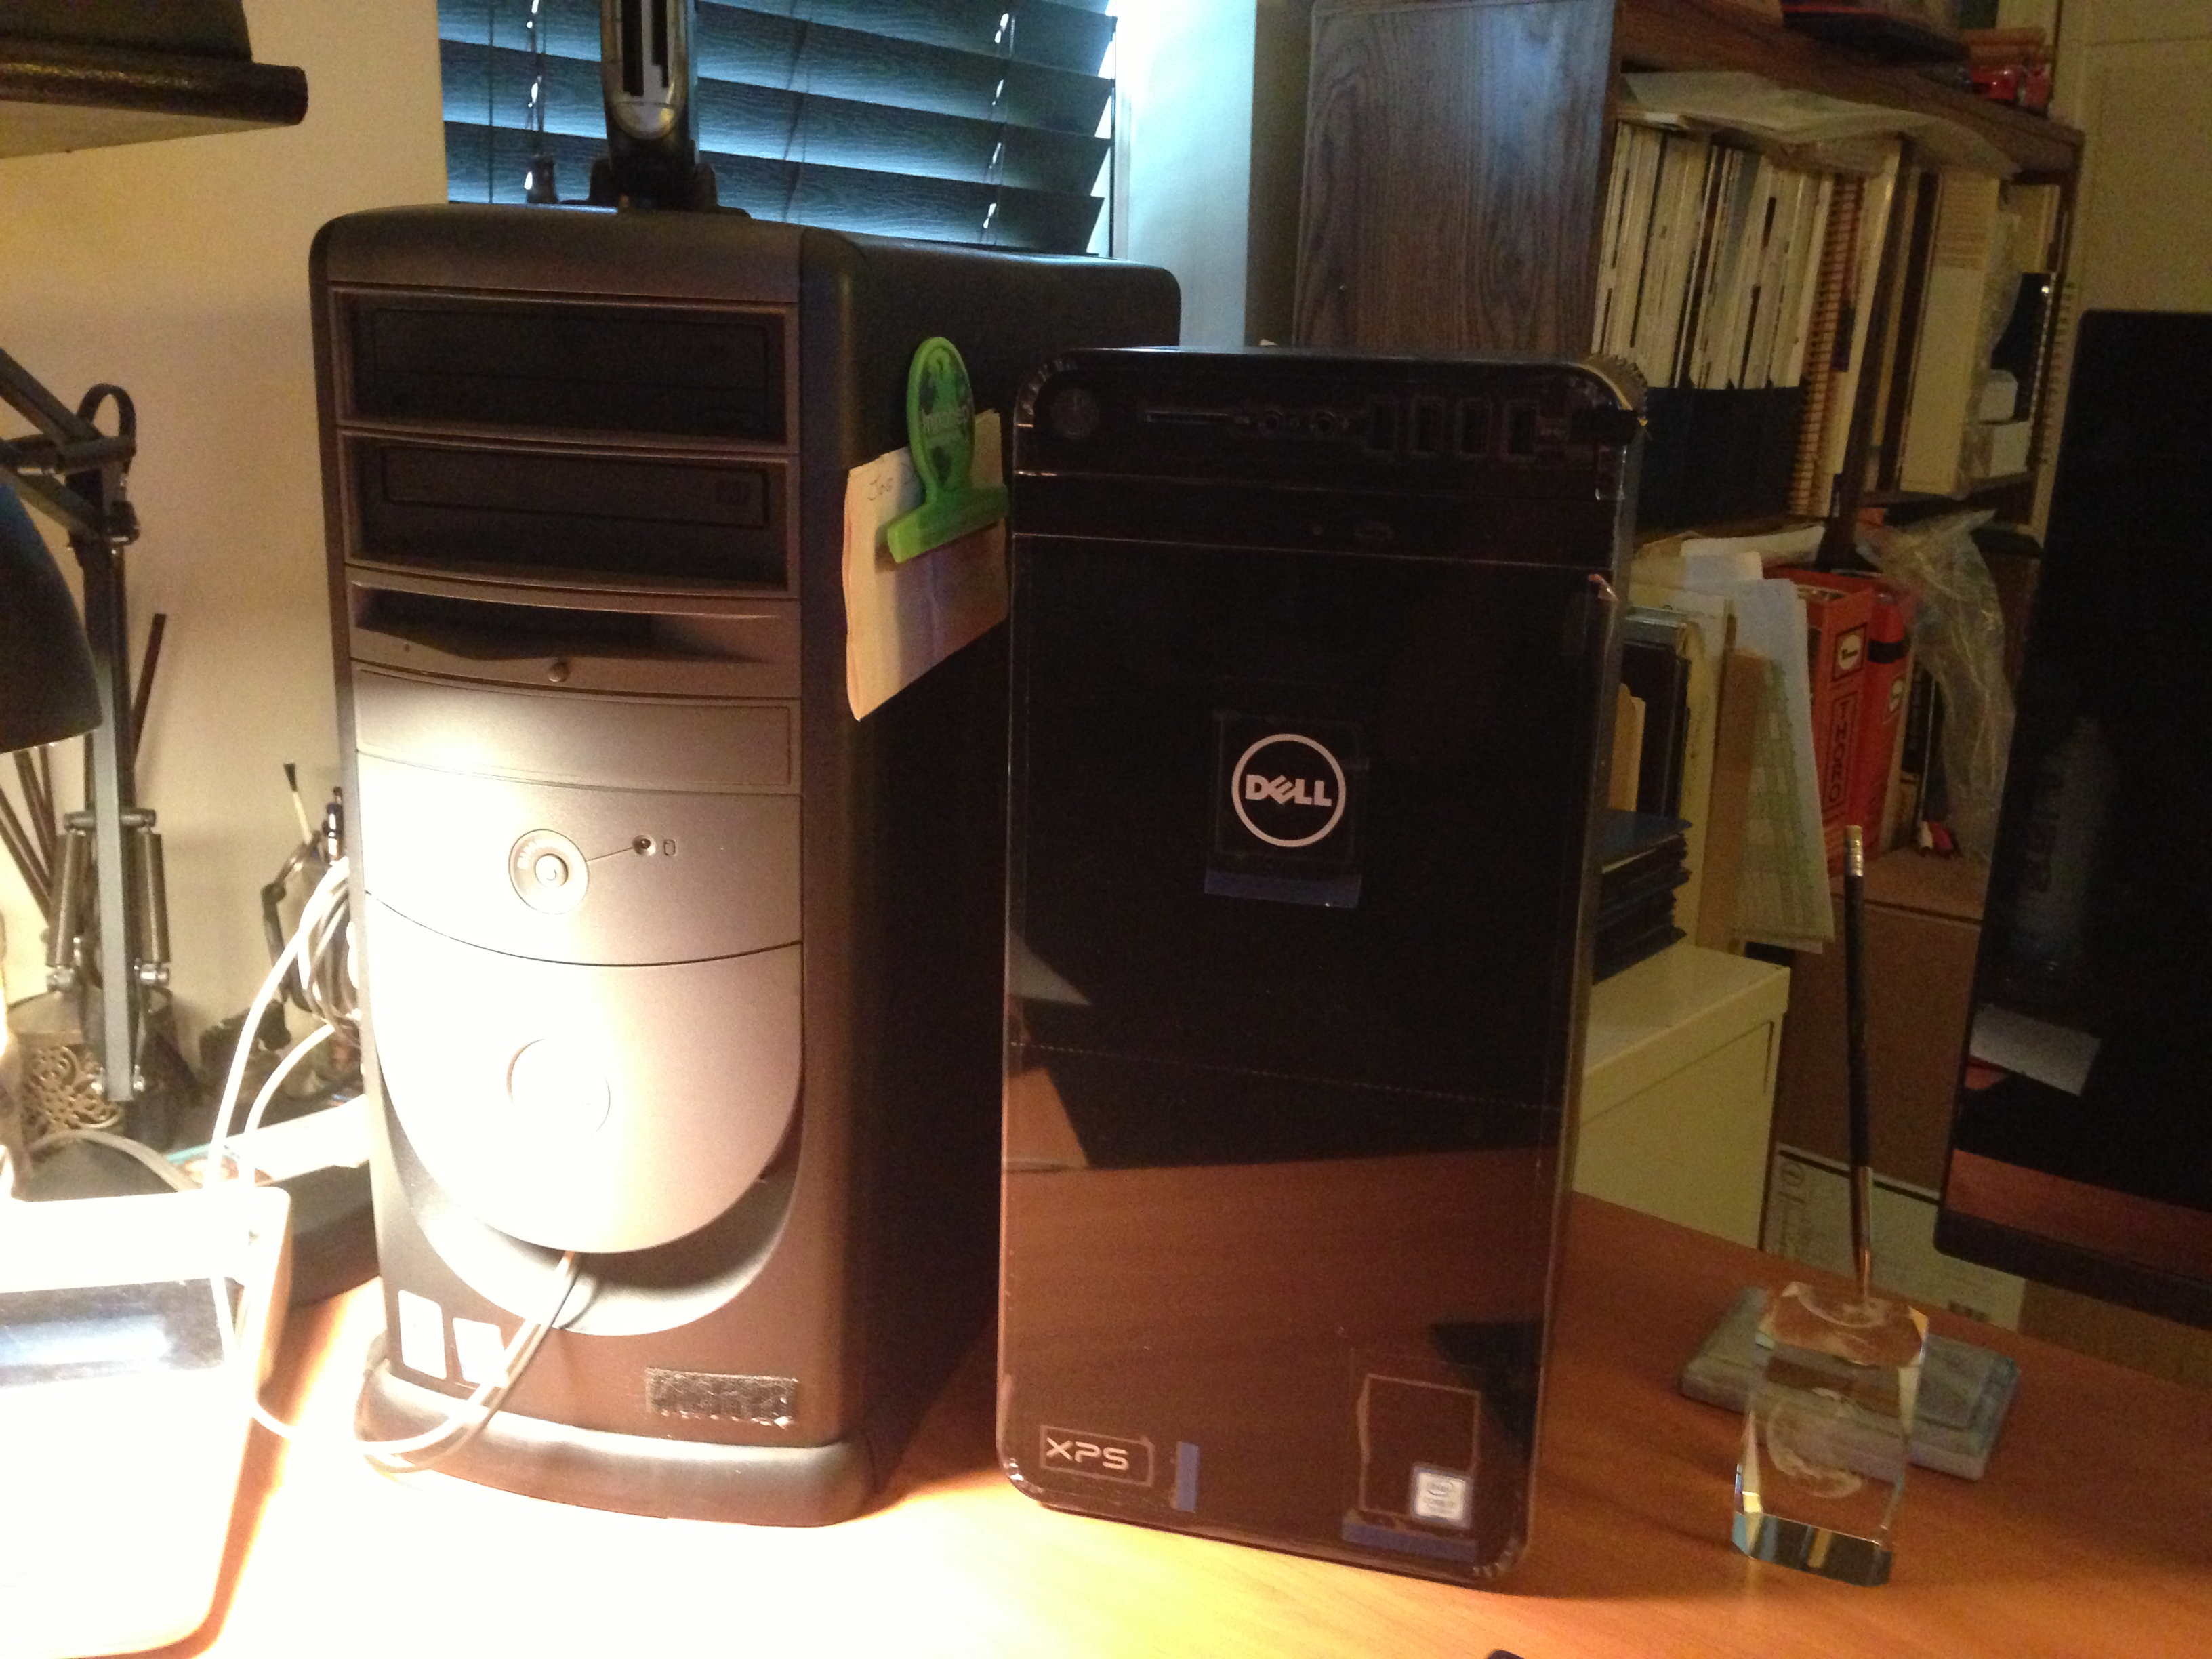 New computer-img_3746.jpg